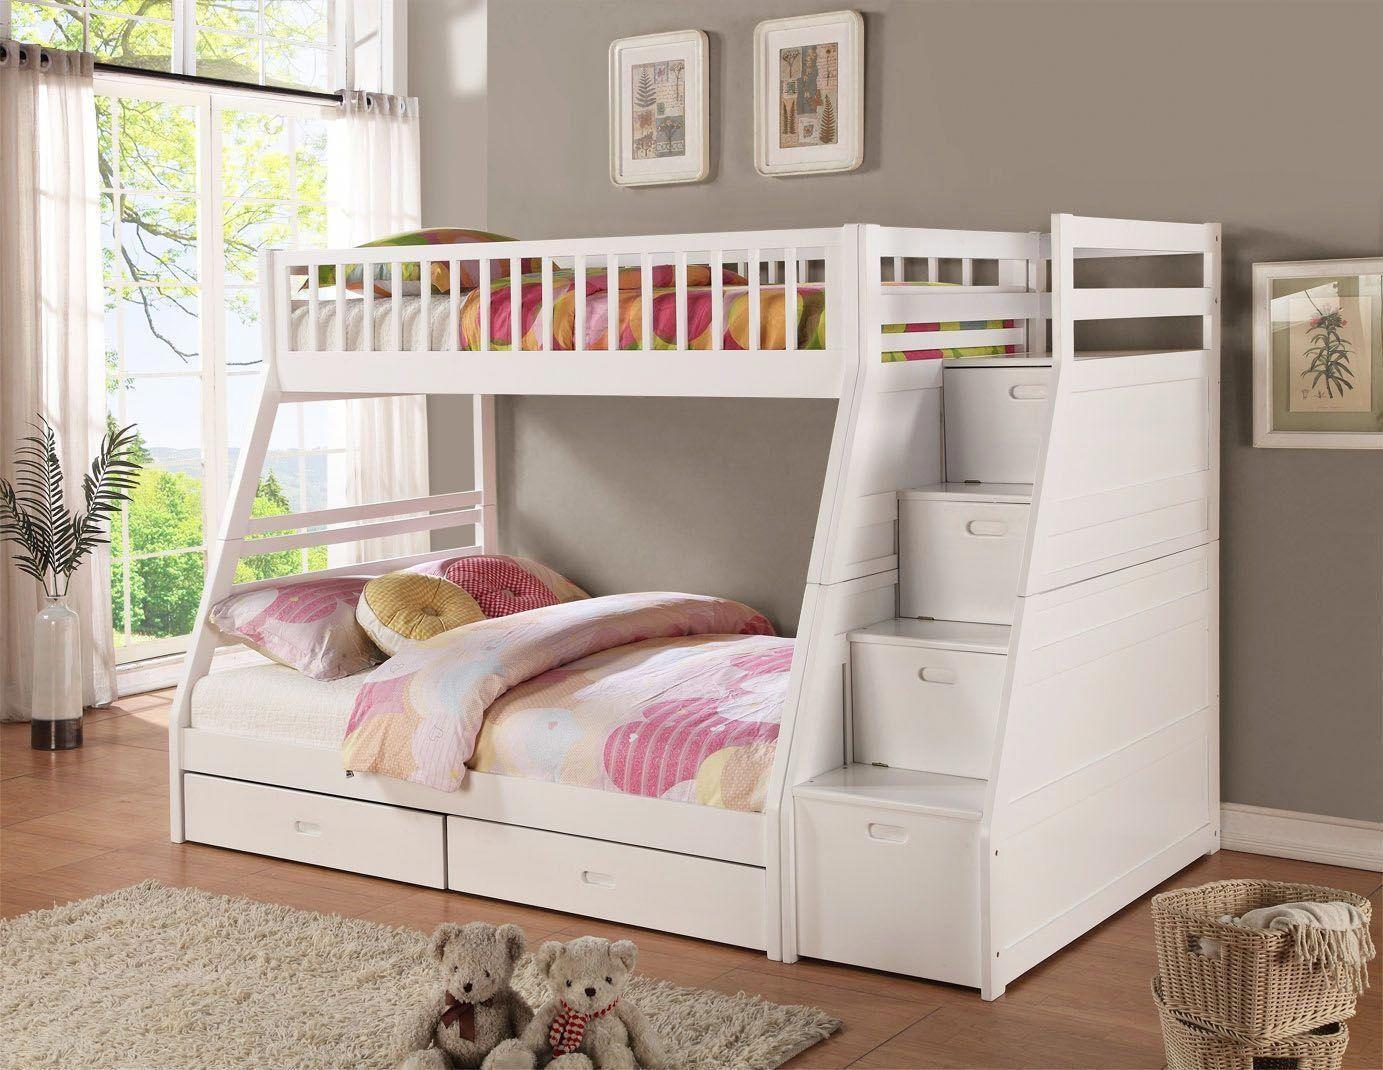 Childrens loft bedroom ideas  How to Choose Practical and Safe Bunk Beds for Kids bunkbedsforkids